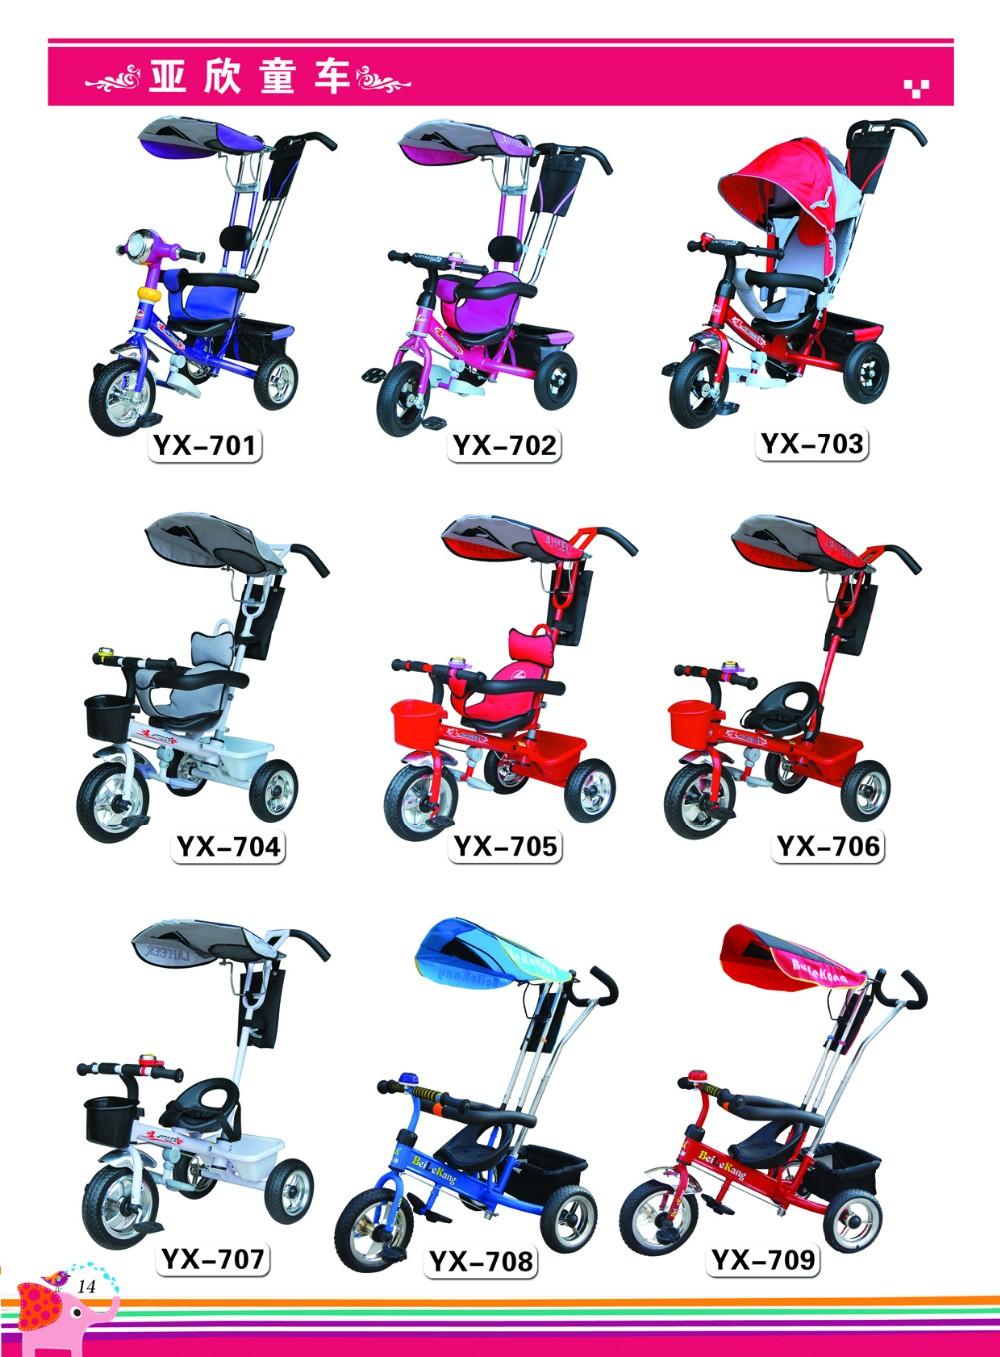 triciclo Product Juguetes Niño Bebé Coche Para Del triciclo Juguete Buy Bebé Niños Sentarse Triciclo 0OkP8nw